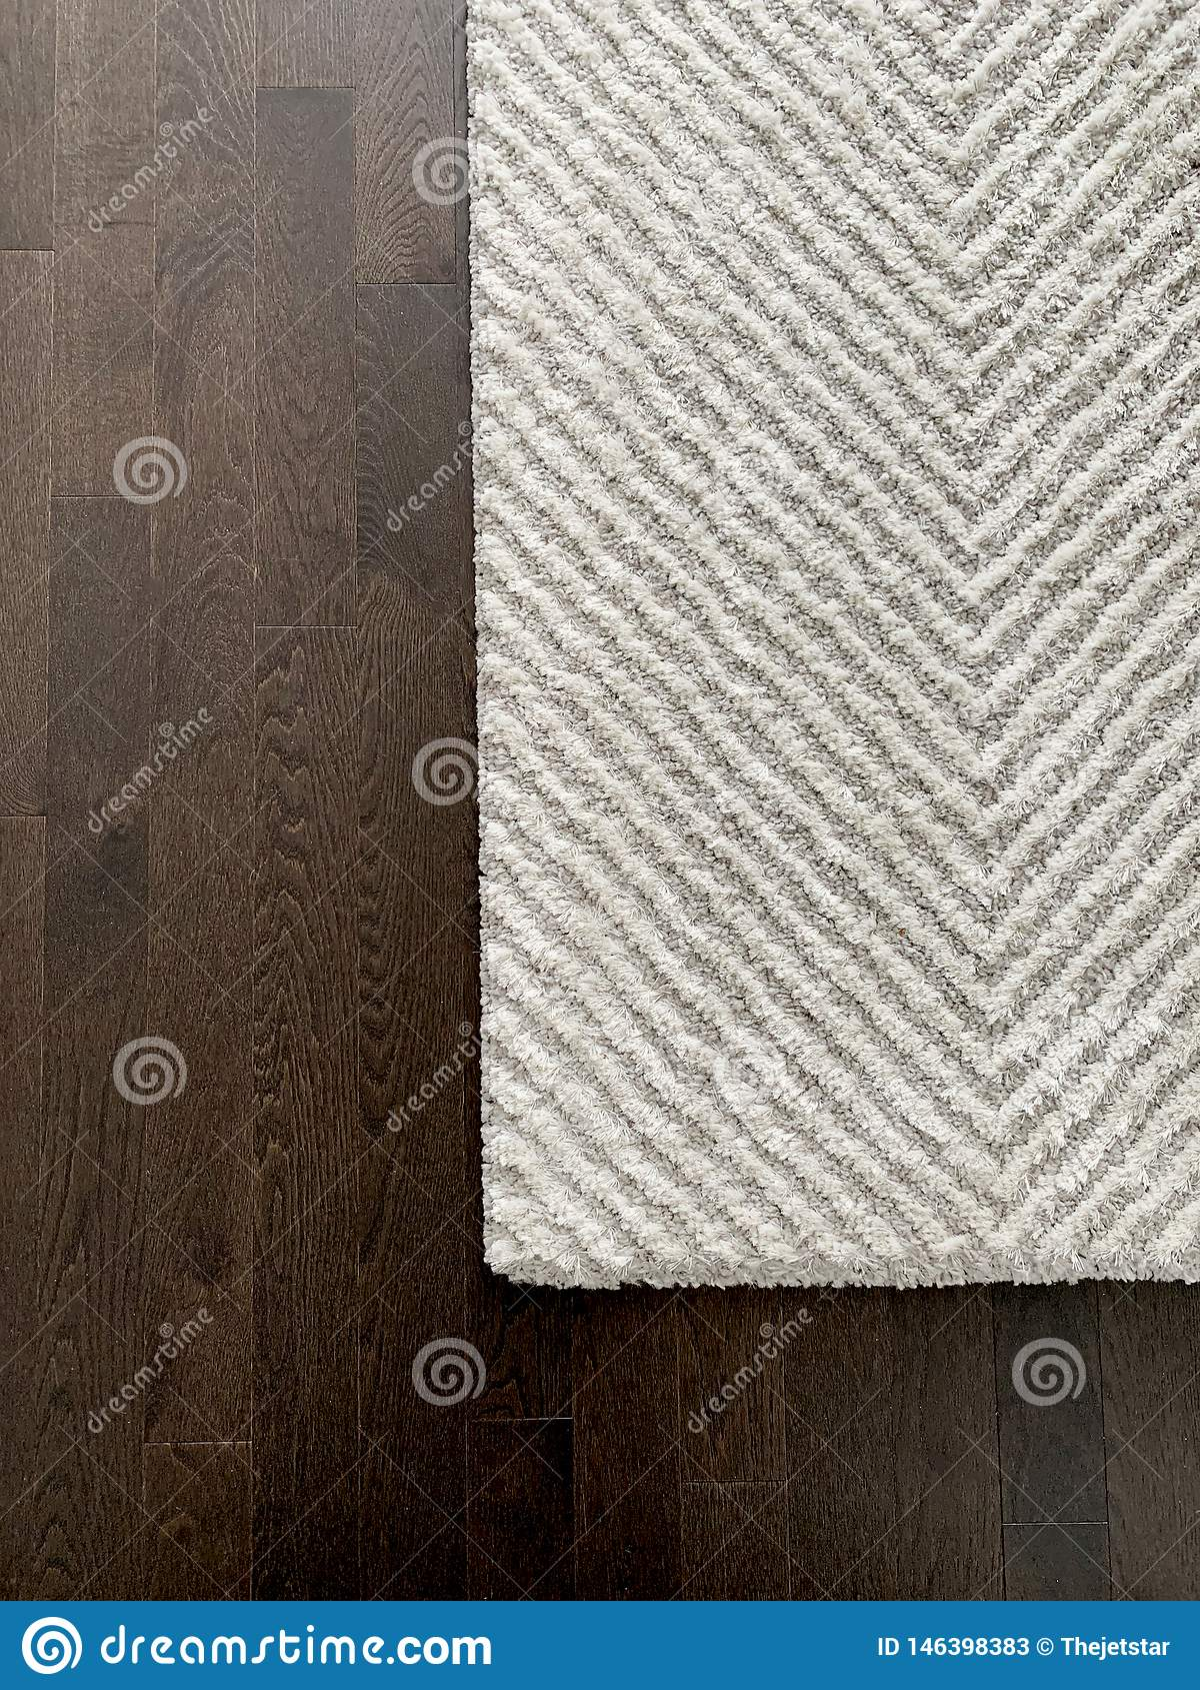 White And Grey Chevron Rug On Dark Harwood Floor Texture Master Bedroom In Modern Luxury Home Stock Image Image Of Carpet Grey 146398383